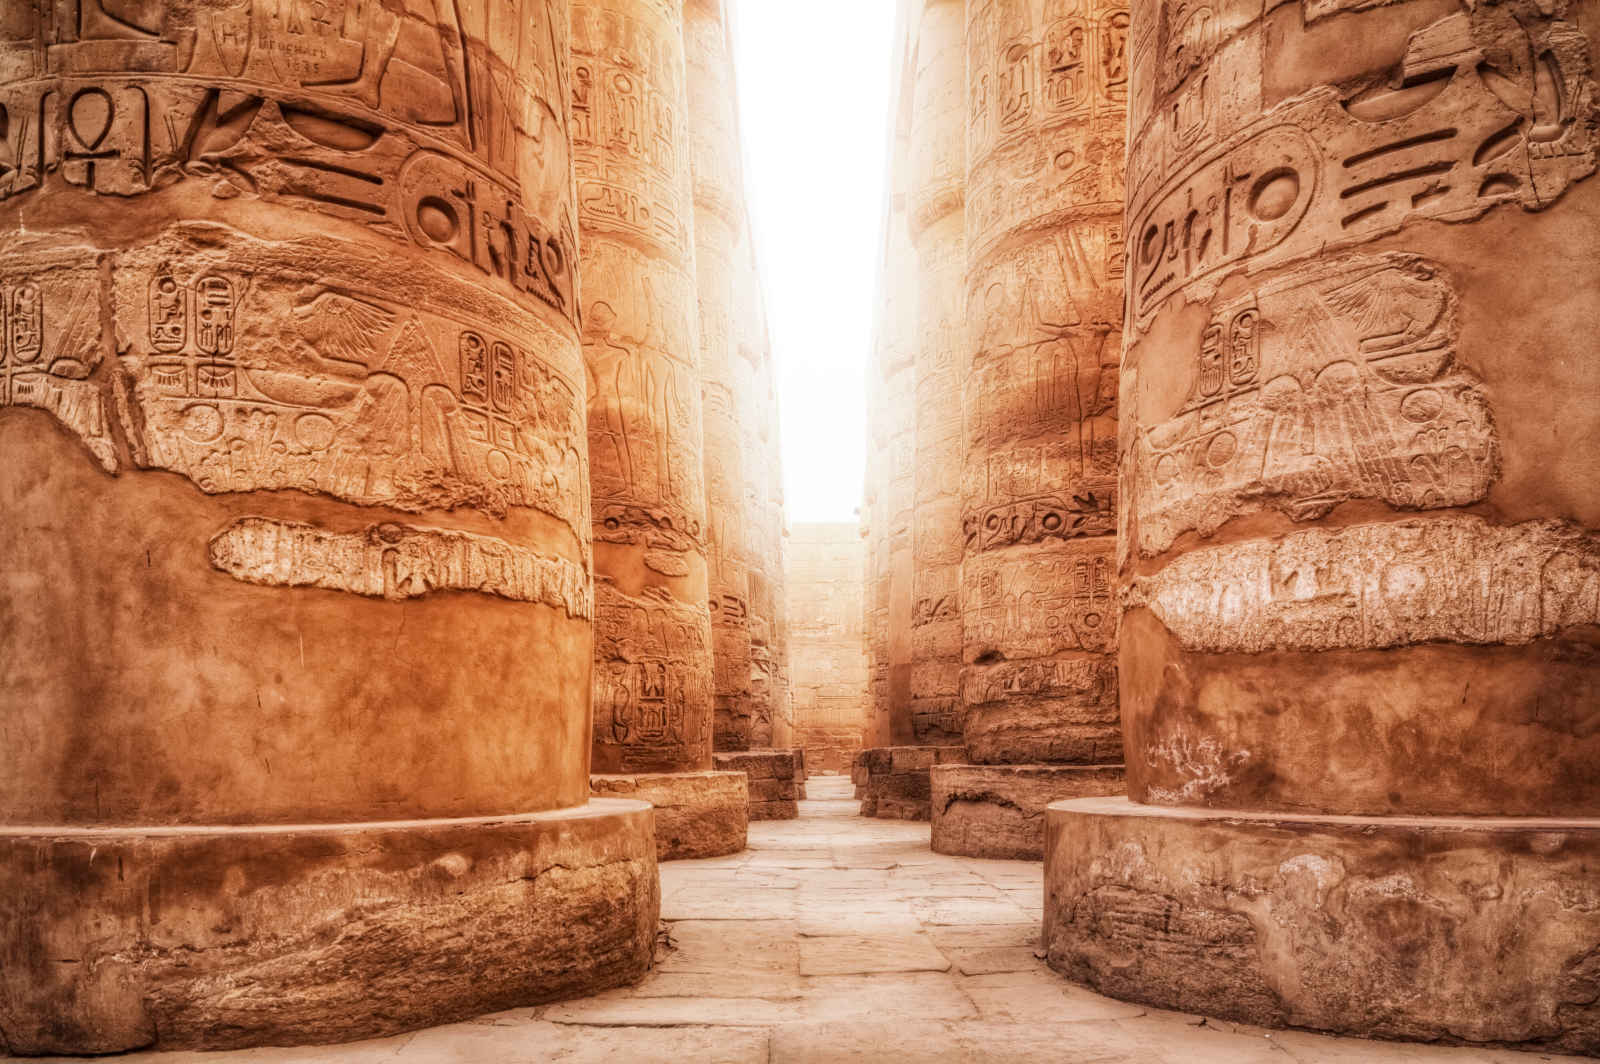 Égypte : Egypte éternelle